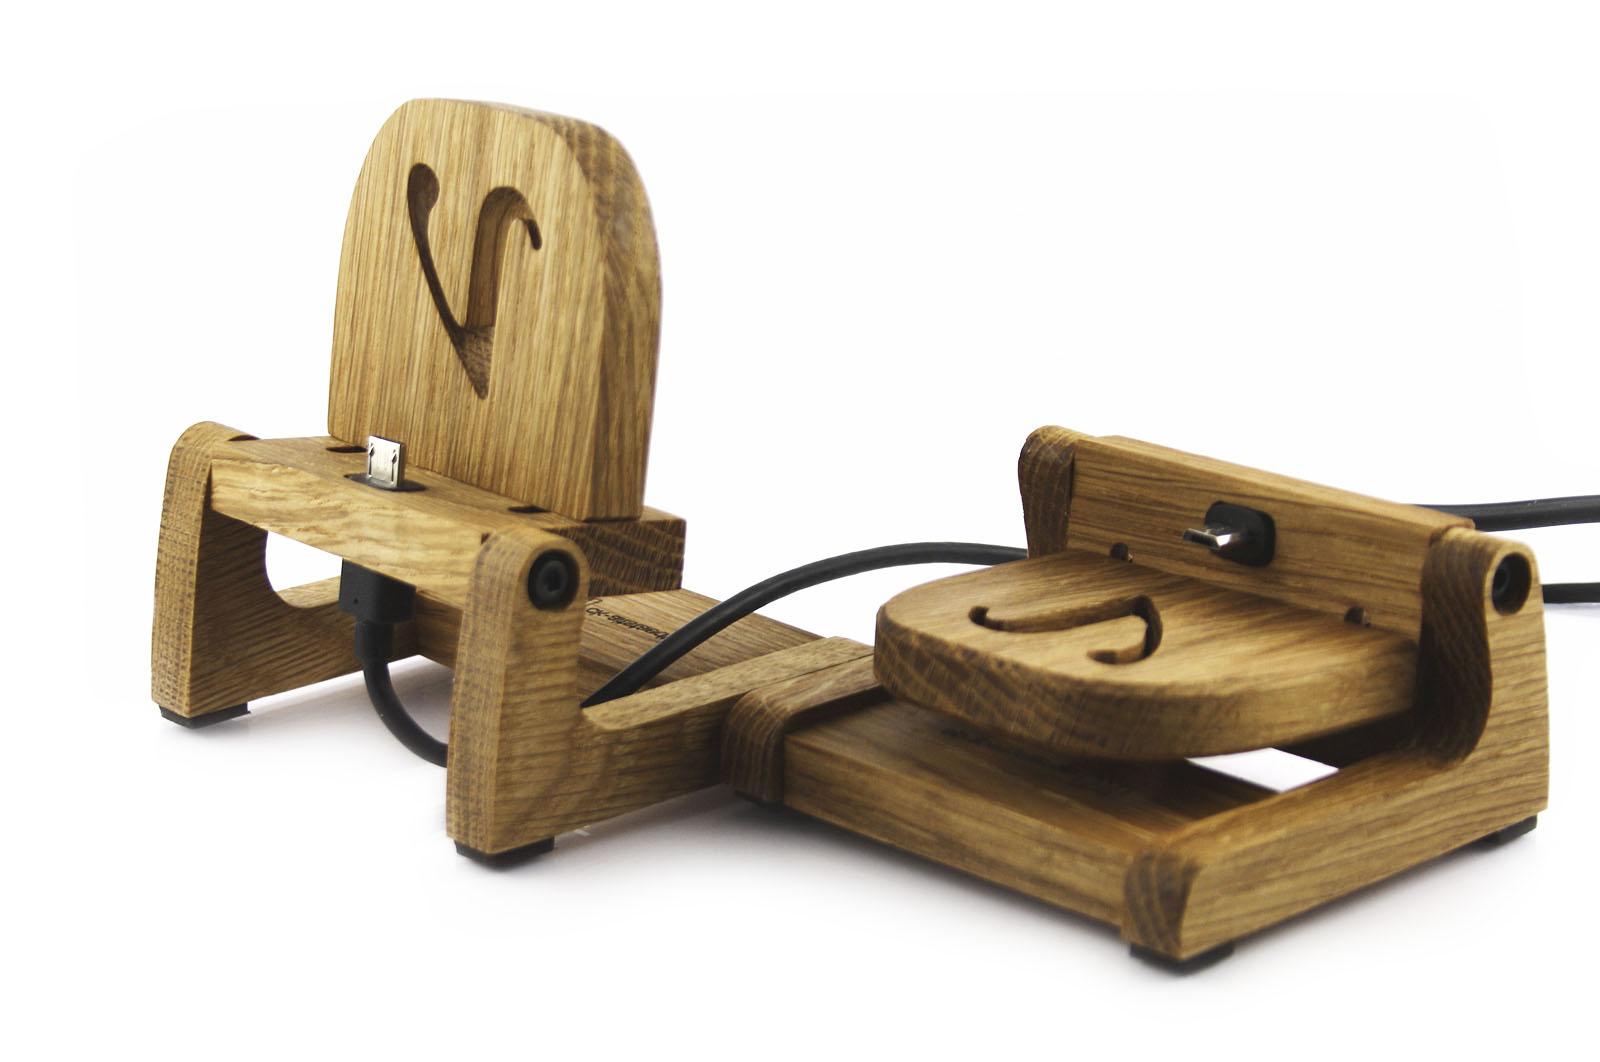 kleingewerbe stepcraft cnc fr sen f r hobby gewerbe. Black Bedroom Furniture Sets. Home Design Ideas